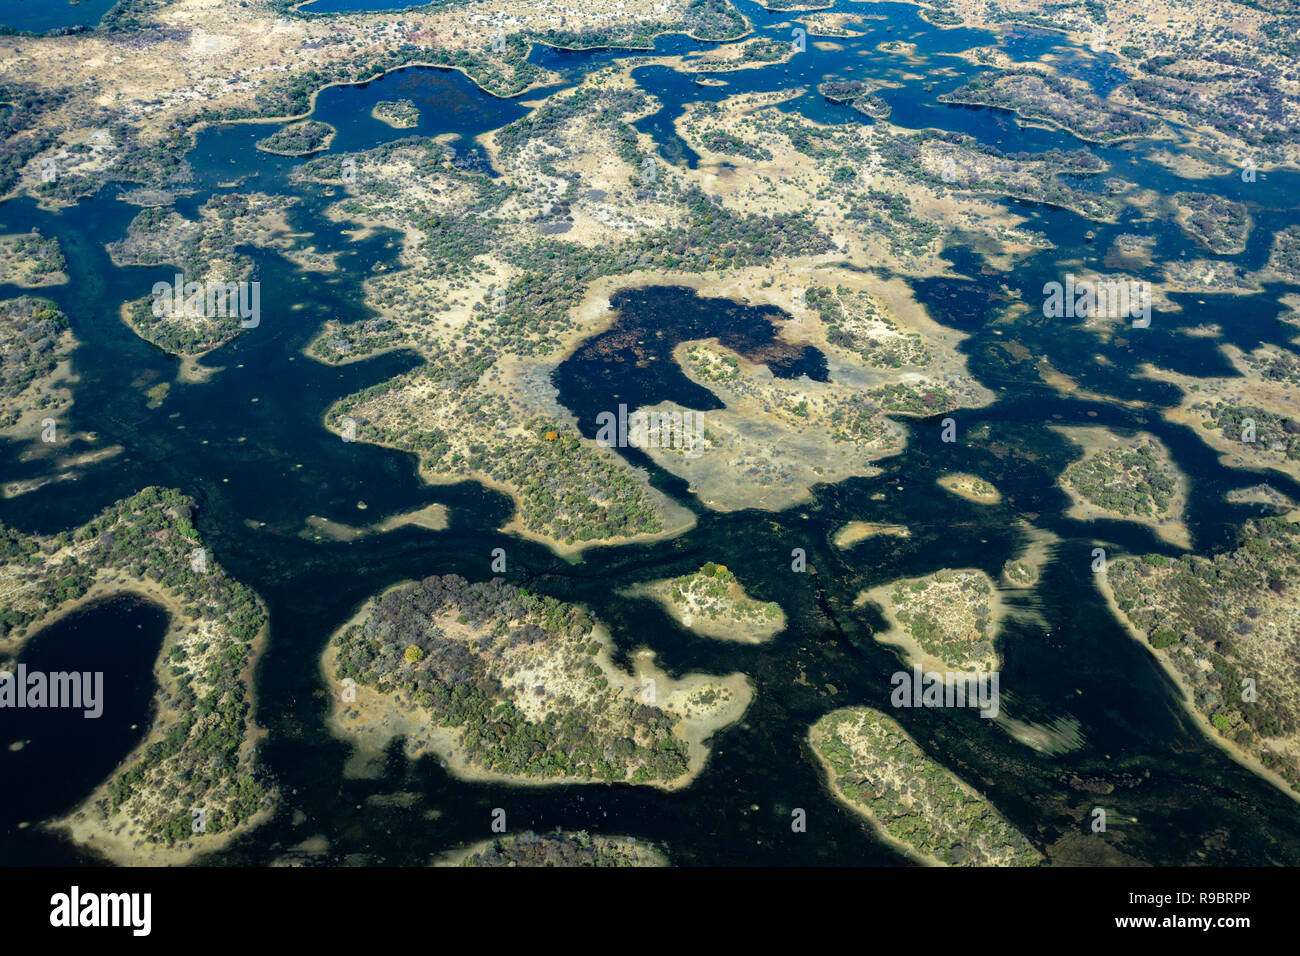 Okavango delta, aerial view, Botswana - Stock Image